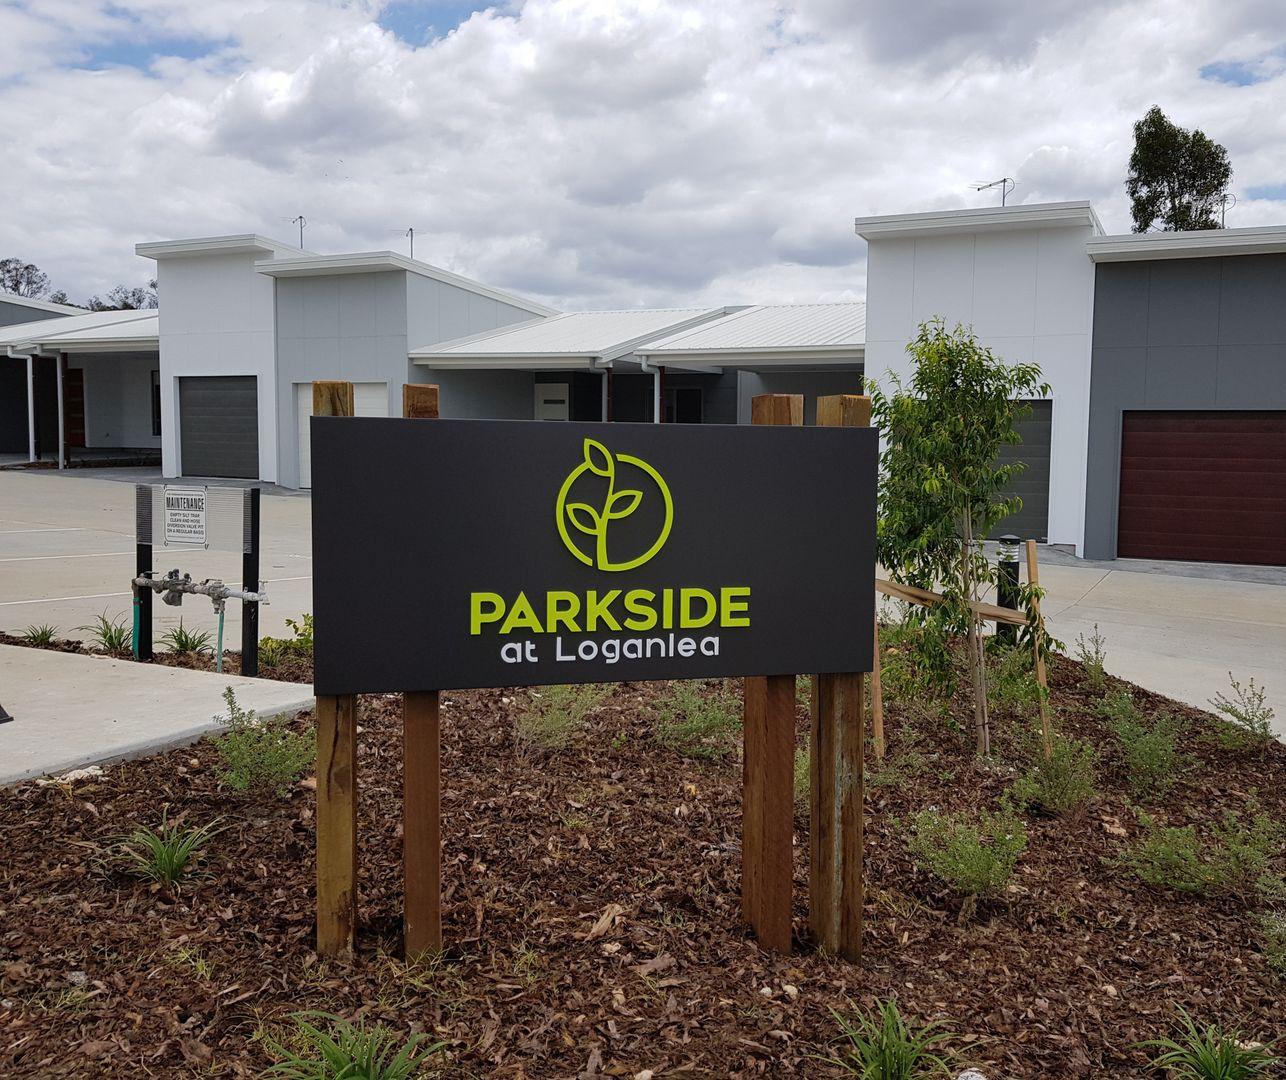 14 Parkside Mews, Loganlea QLD 4131, Image 0